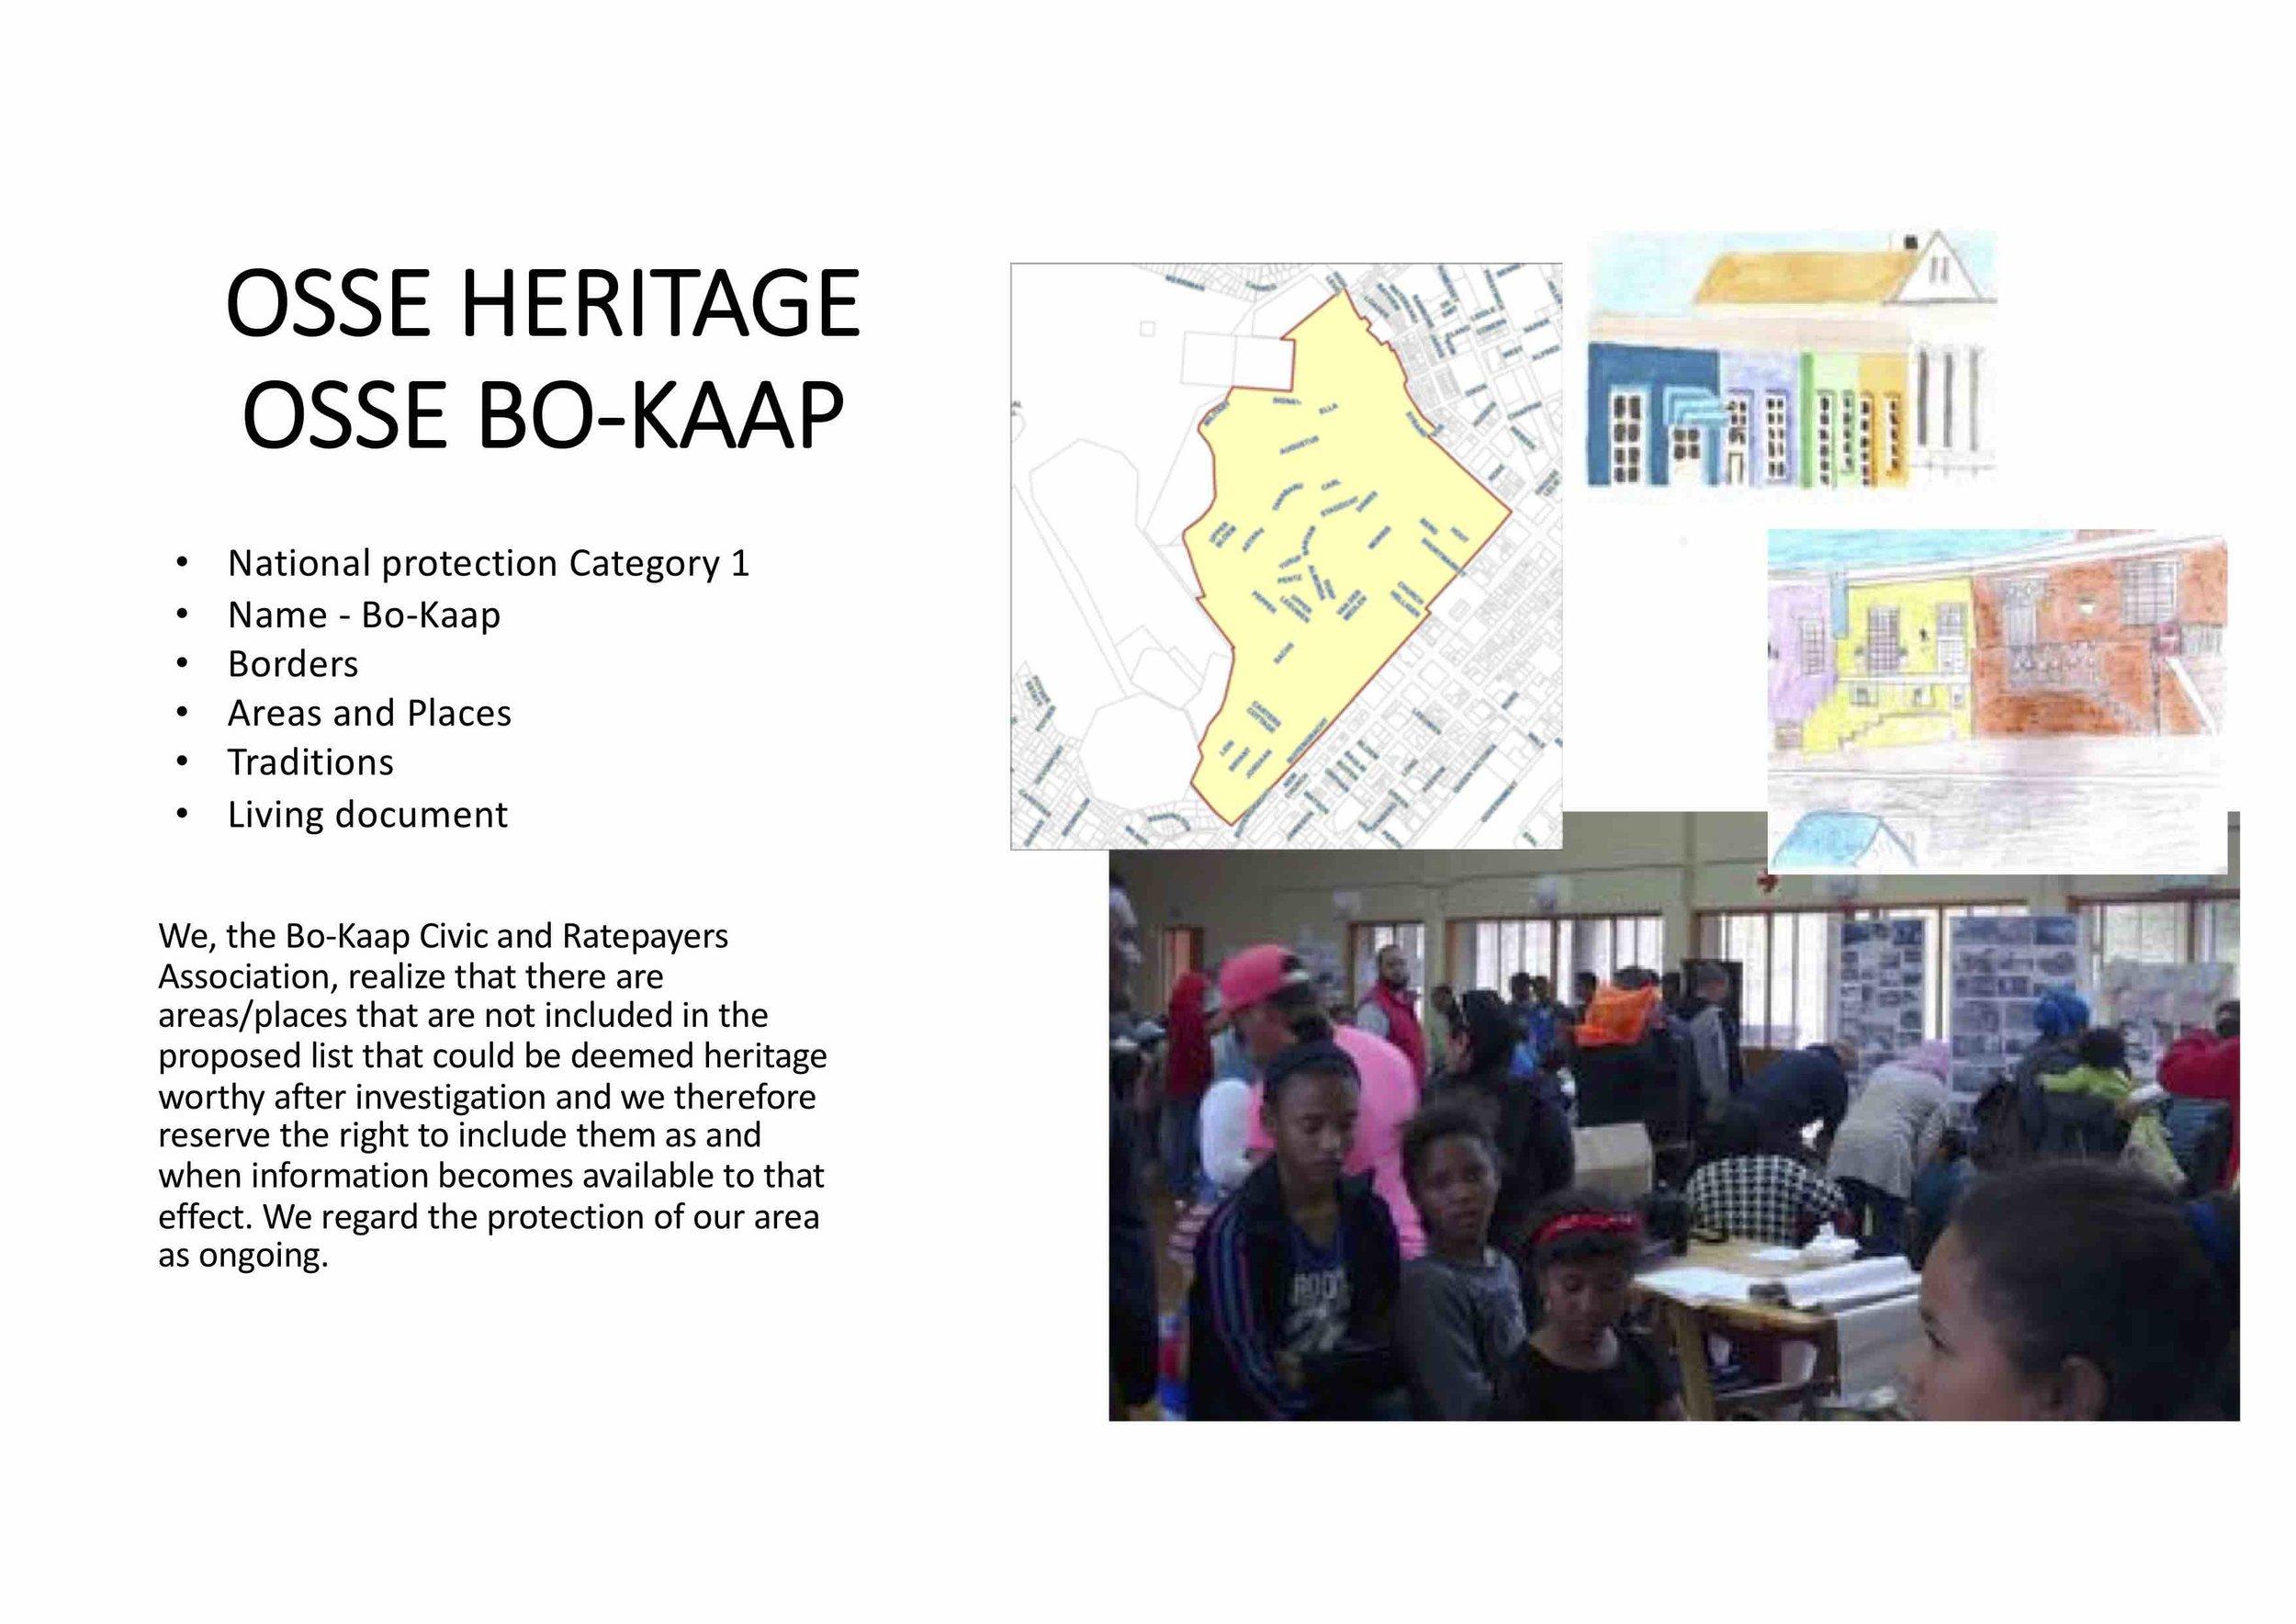 2019 02 09 HPOZ hearings Civic final presentation - 06.jpg